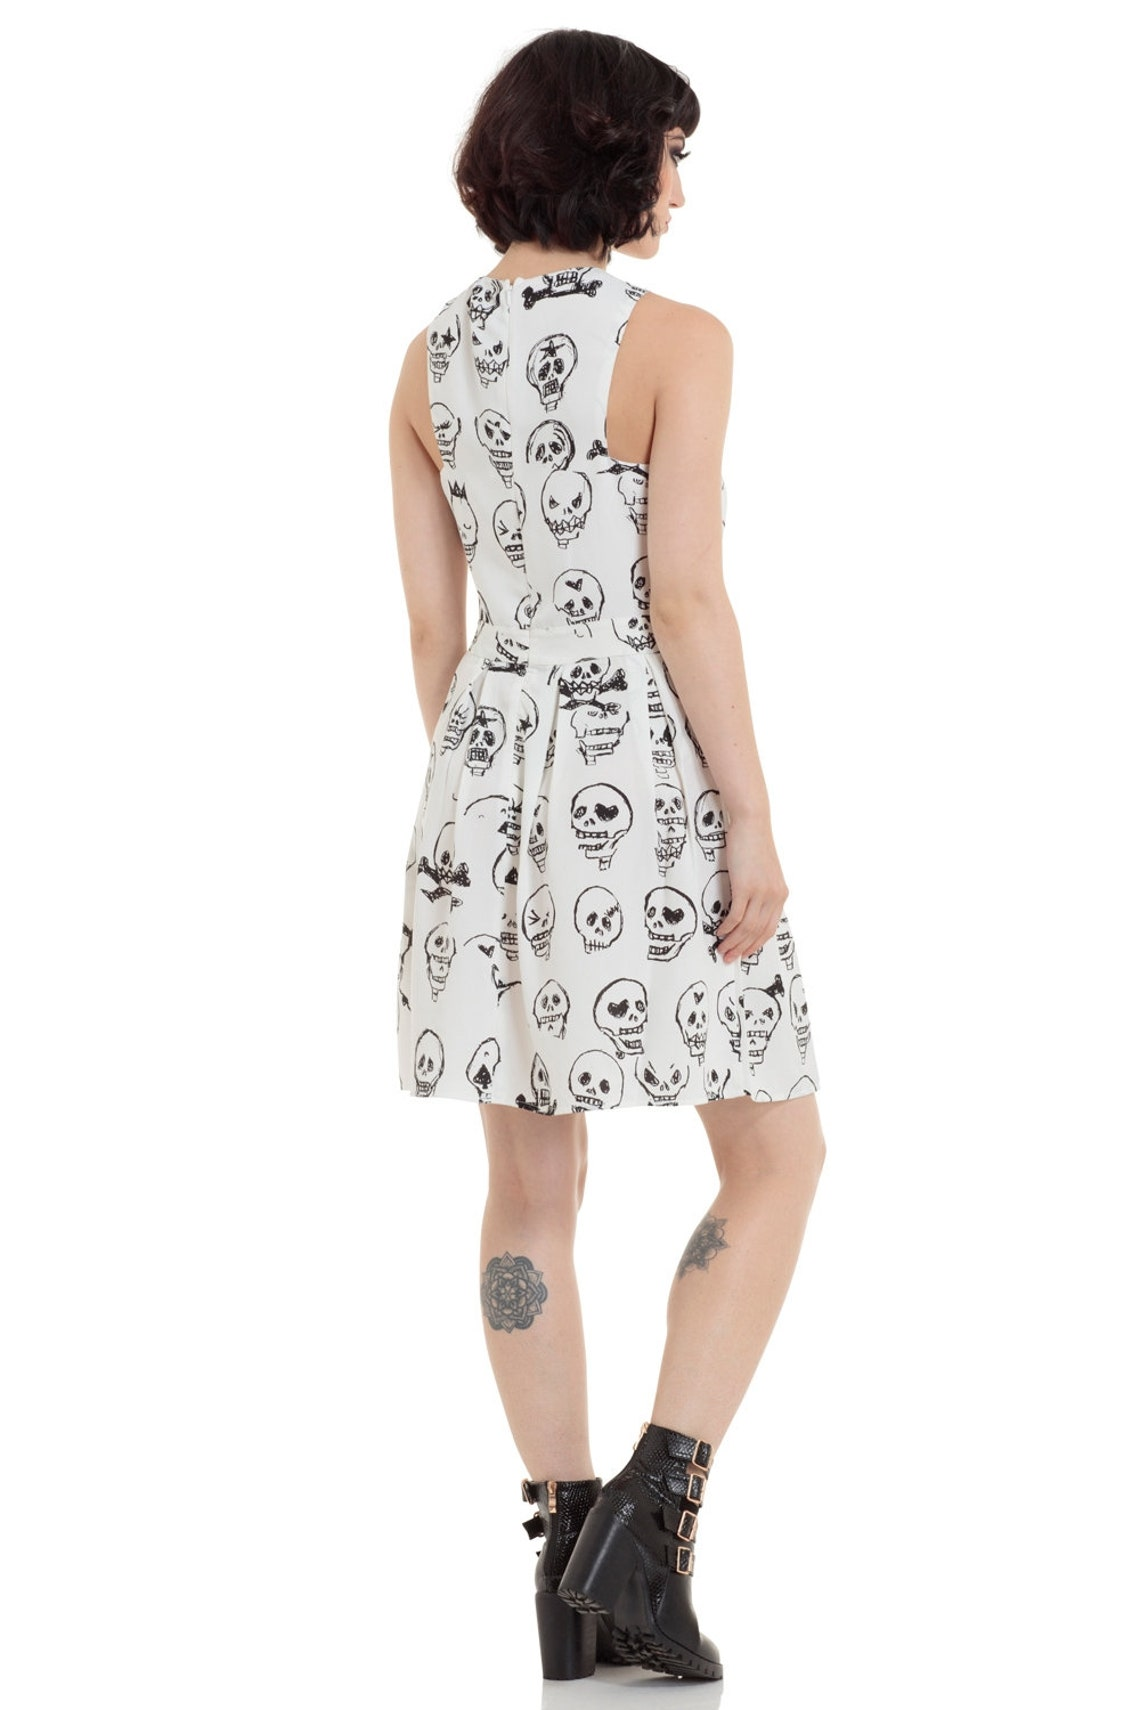 Black White Cut Out Skull Doodle White Mini Dress Gothic